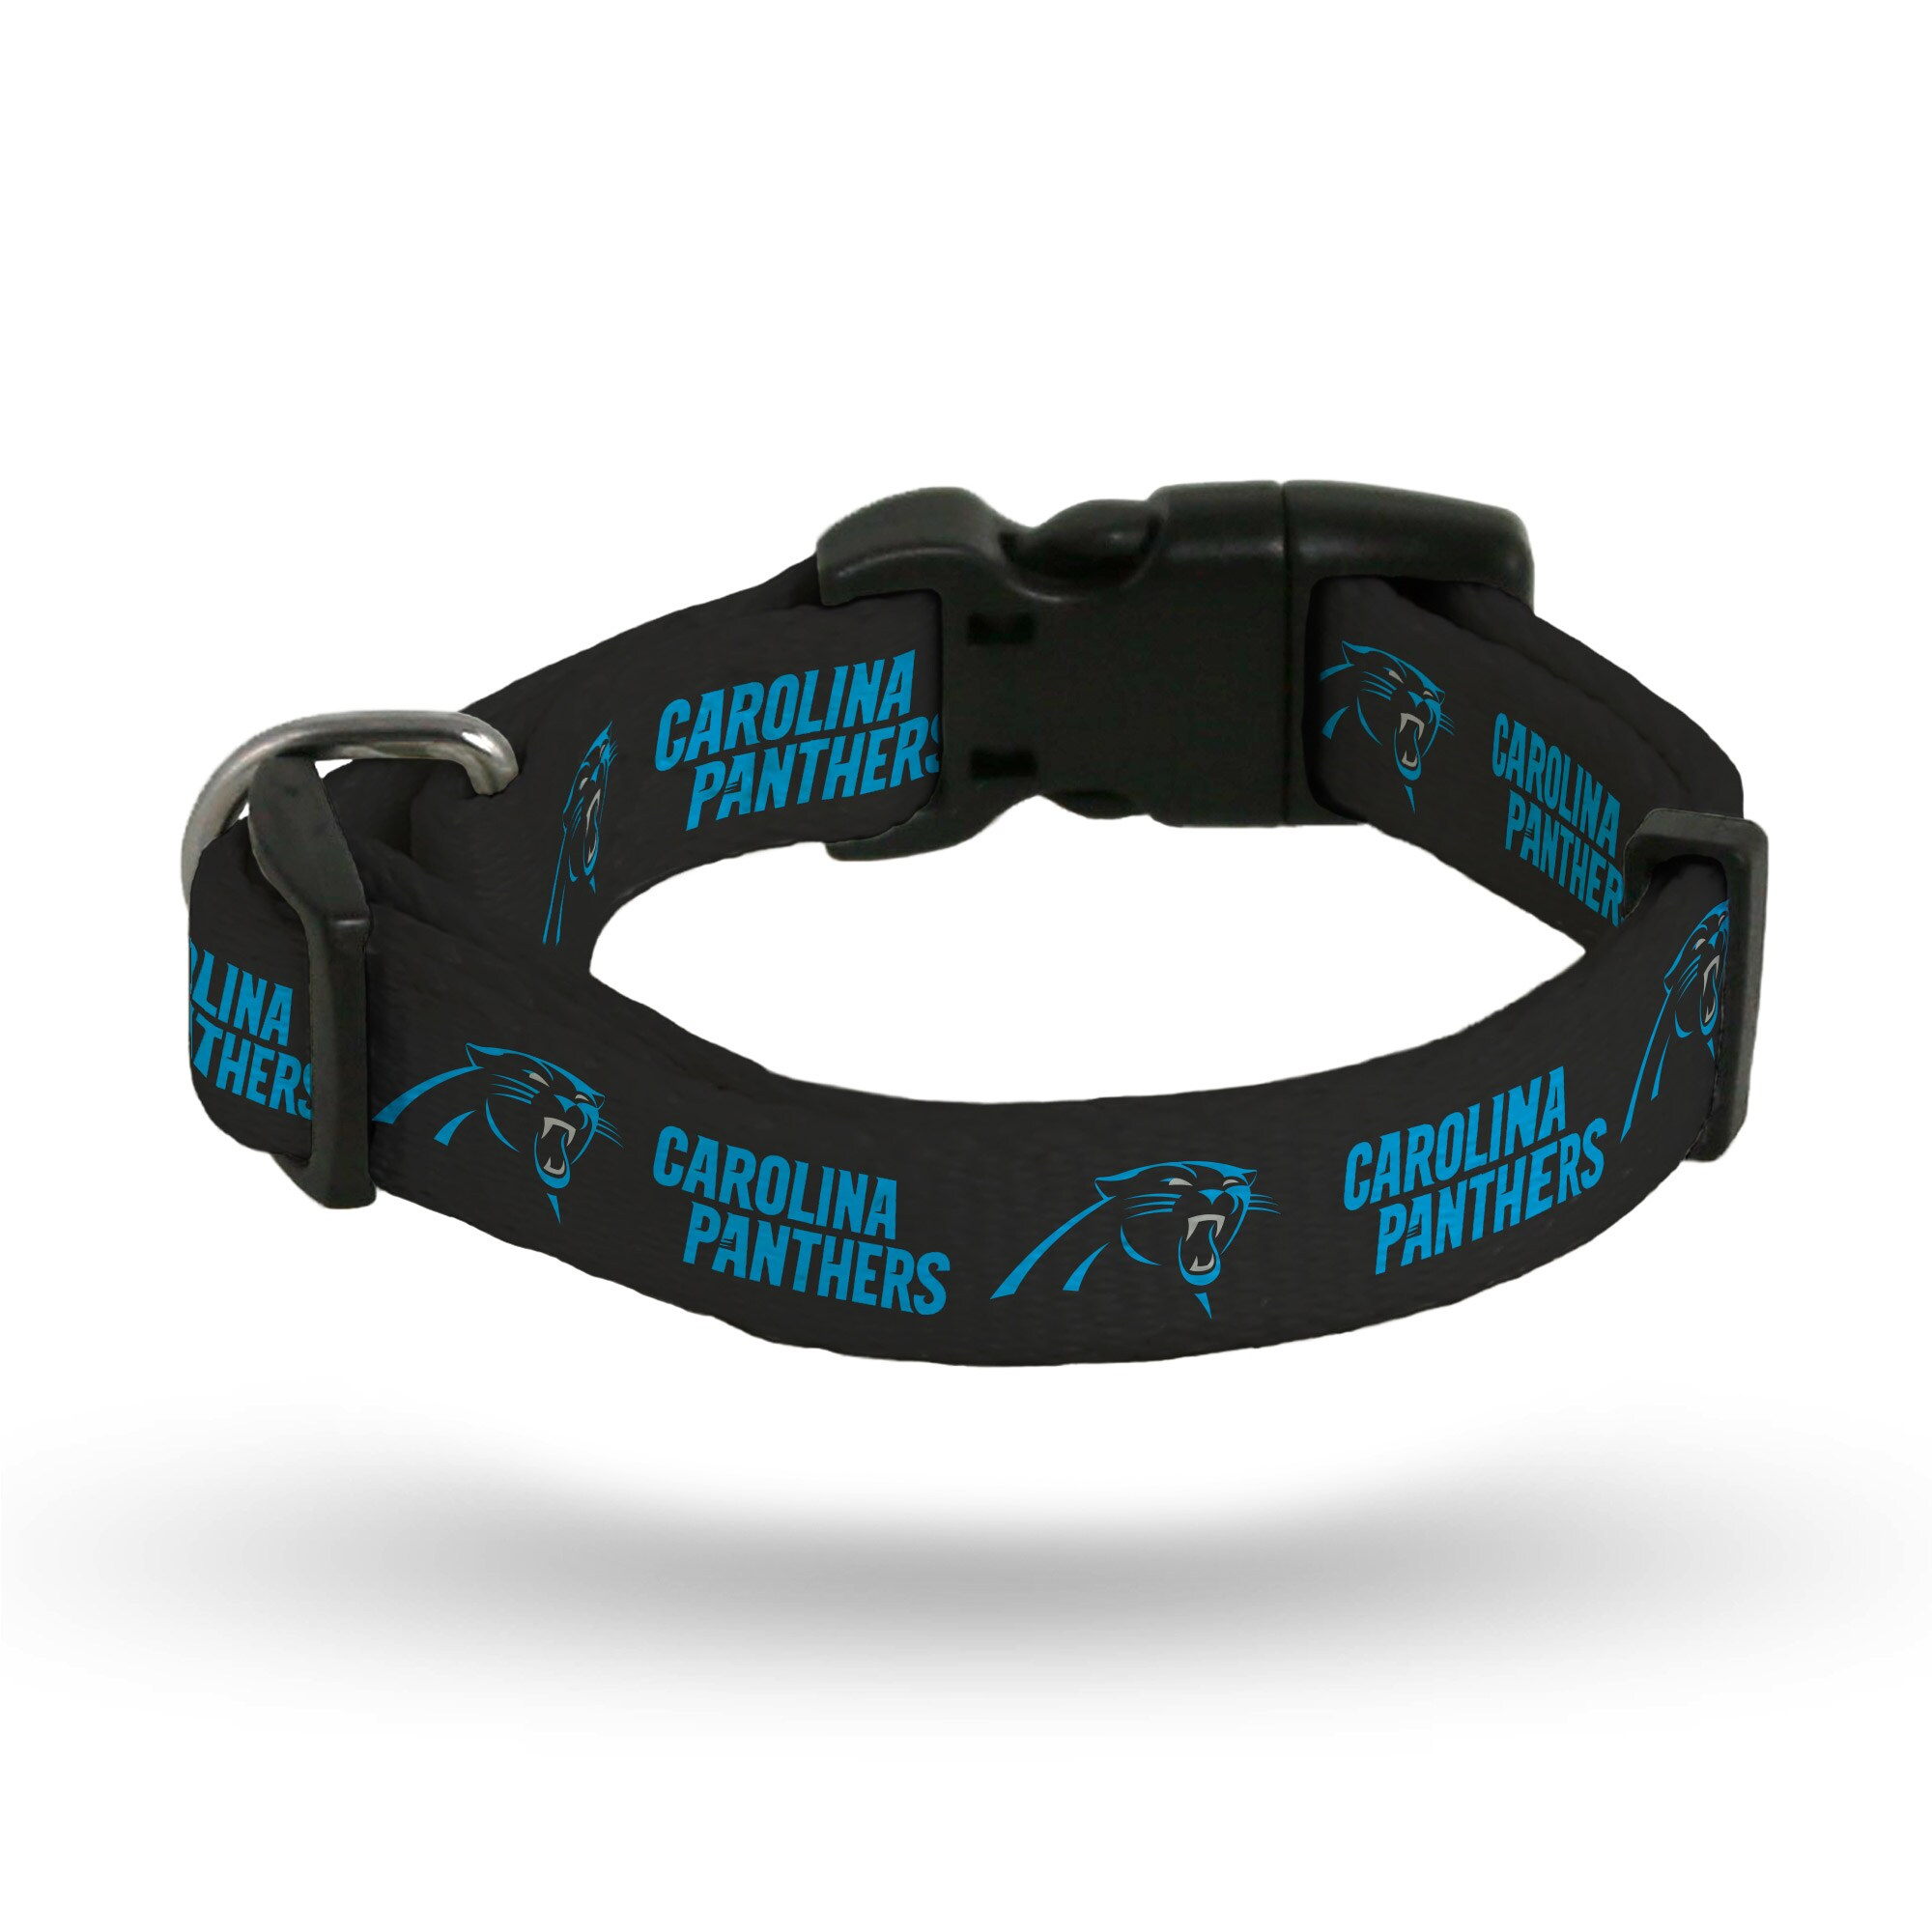 Carolina Panthers Sparo Rugged Pet Collar